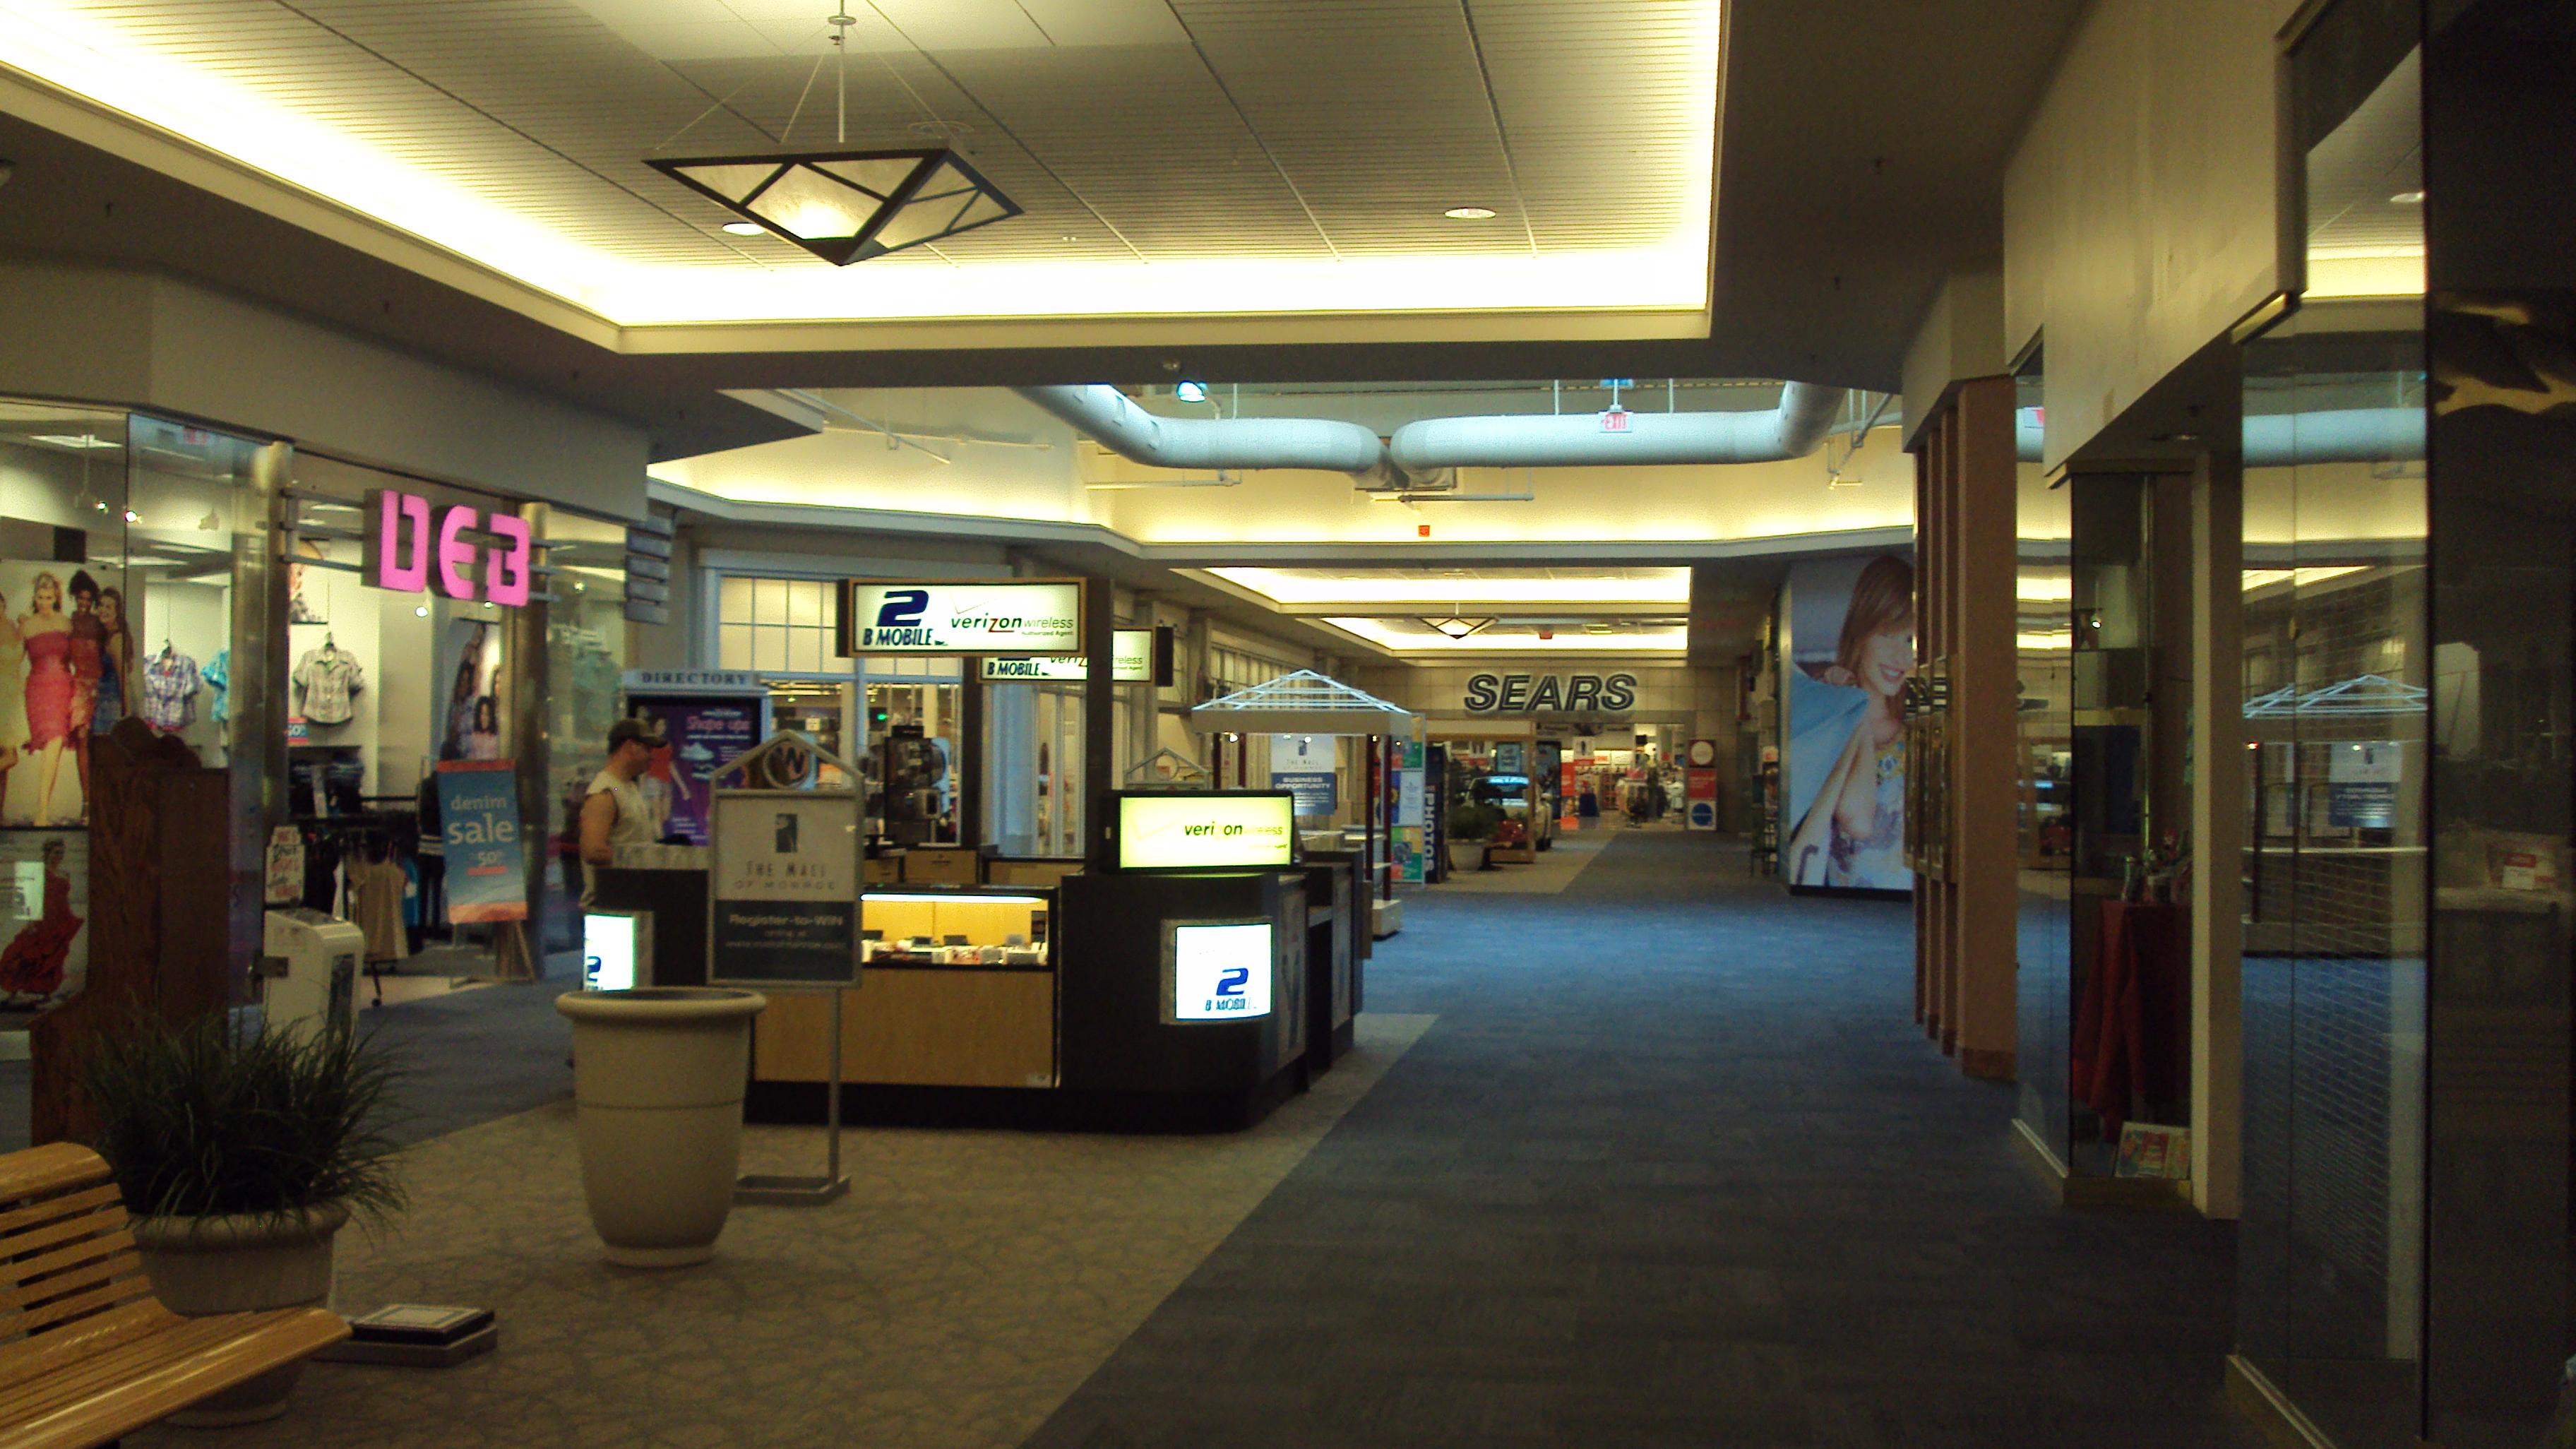 6c63200c6c The Mall of Monroe - Wikipedia